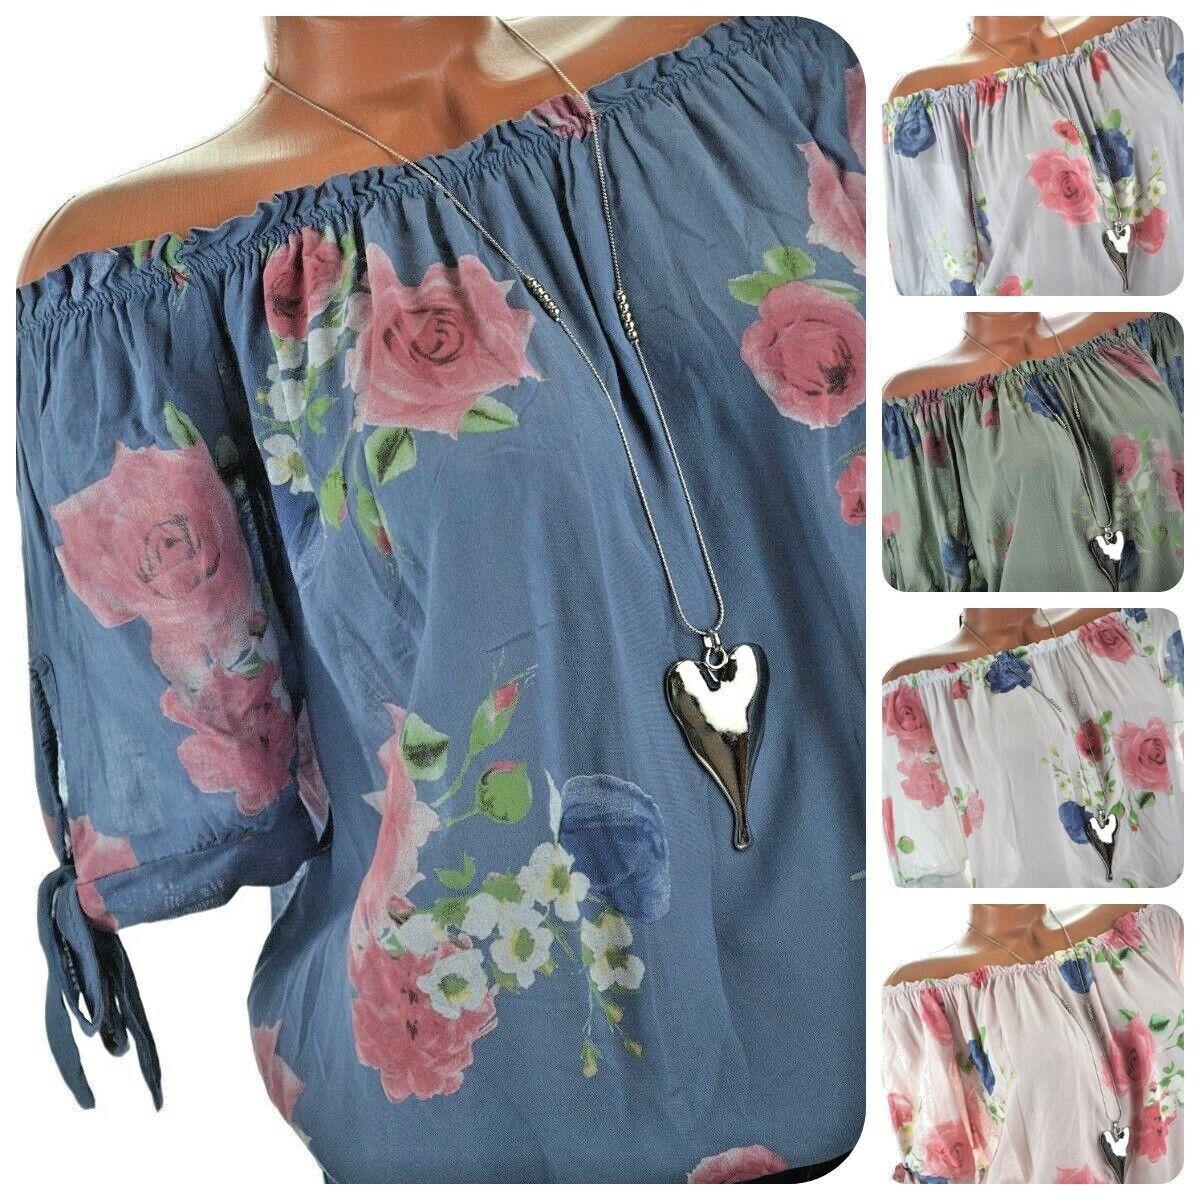 Carmen Bluse Damen Tunika mit Blumen Print 38 40 42 NEU Made in Italy